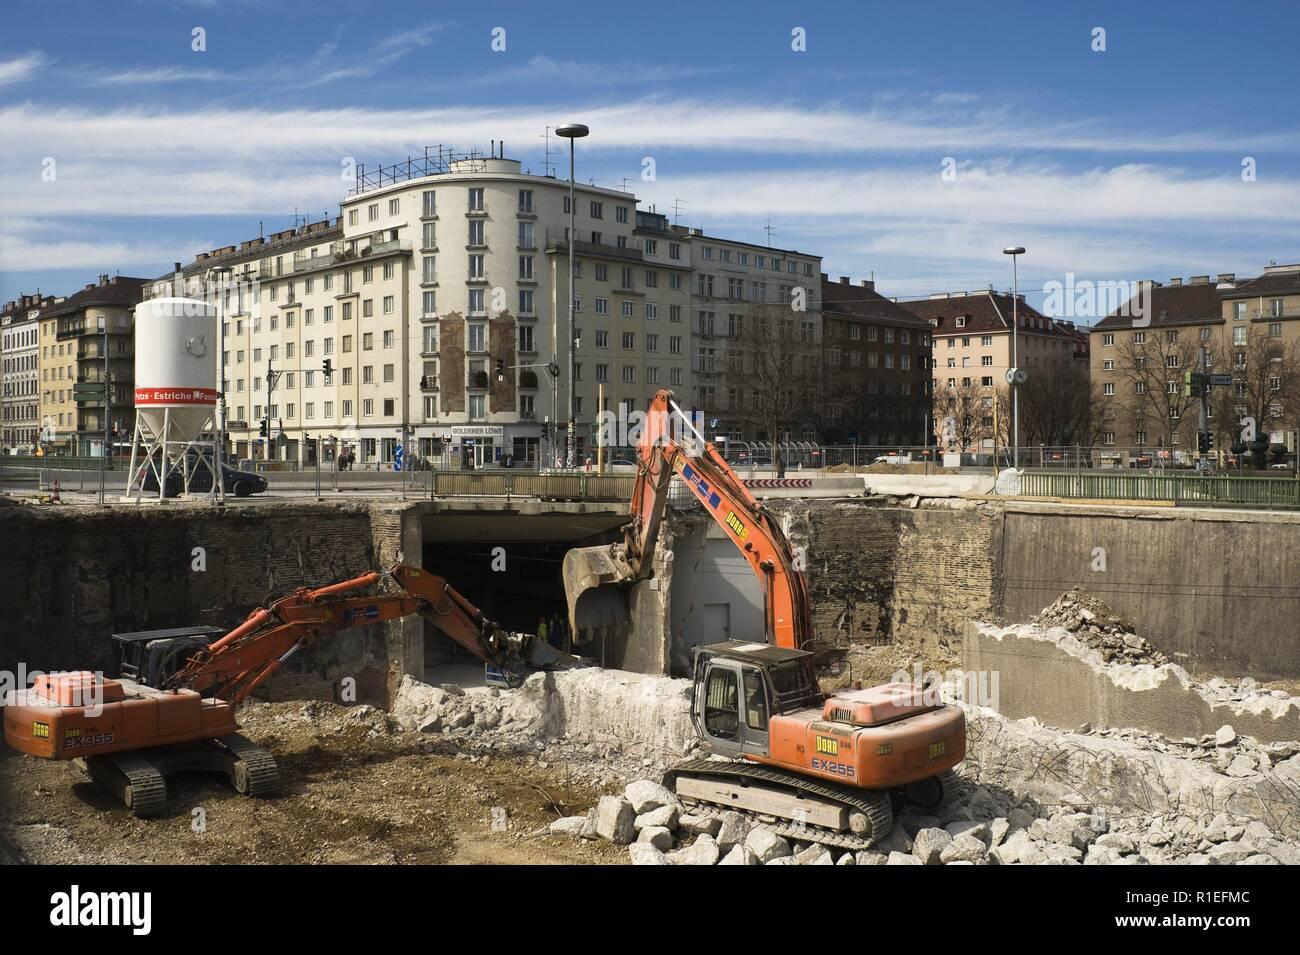 Wien, Straßenbahn, Bauarbeiten Hauptbahnhofanbindung Südtirolerplatz - Vienna, Subway Construction - Stock Image